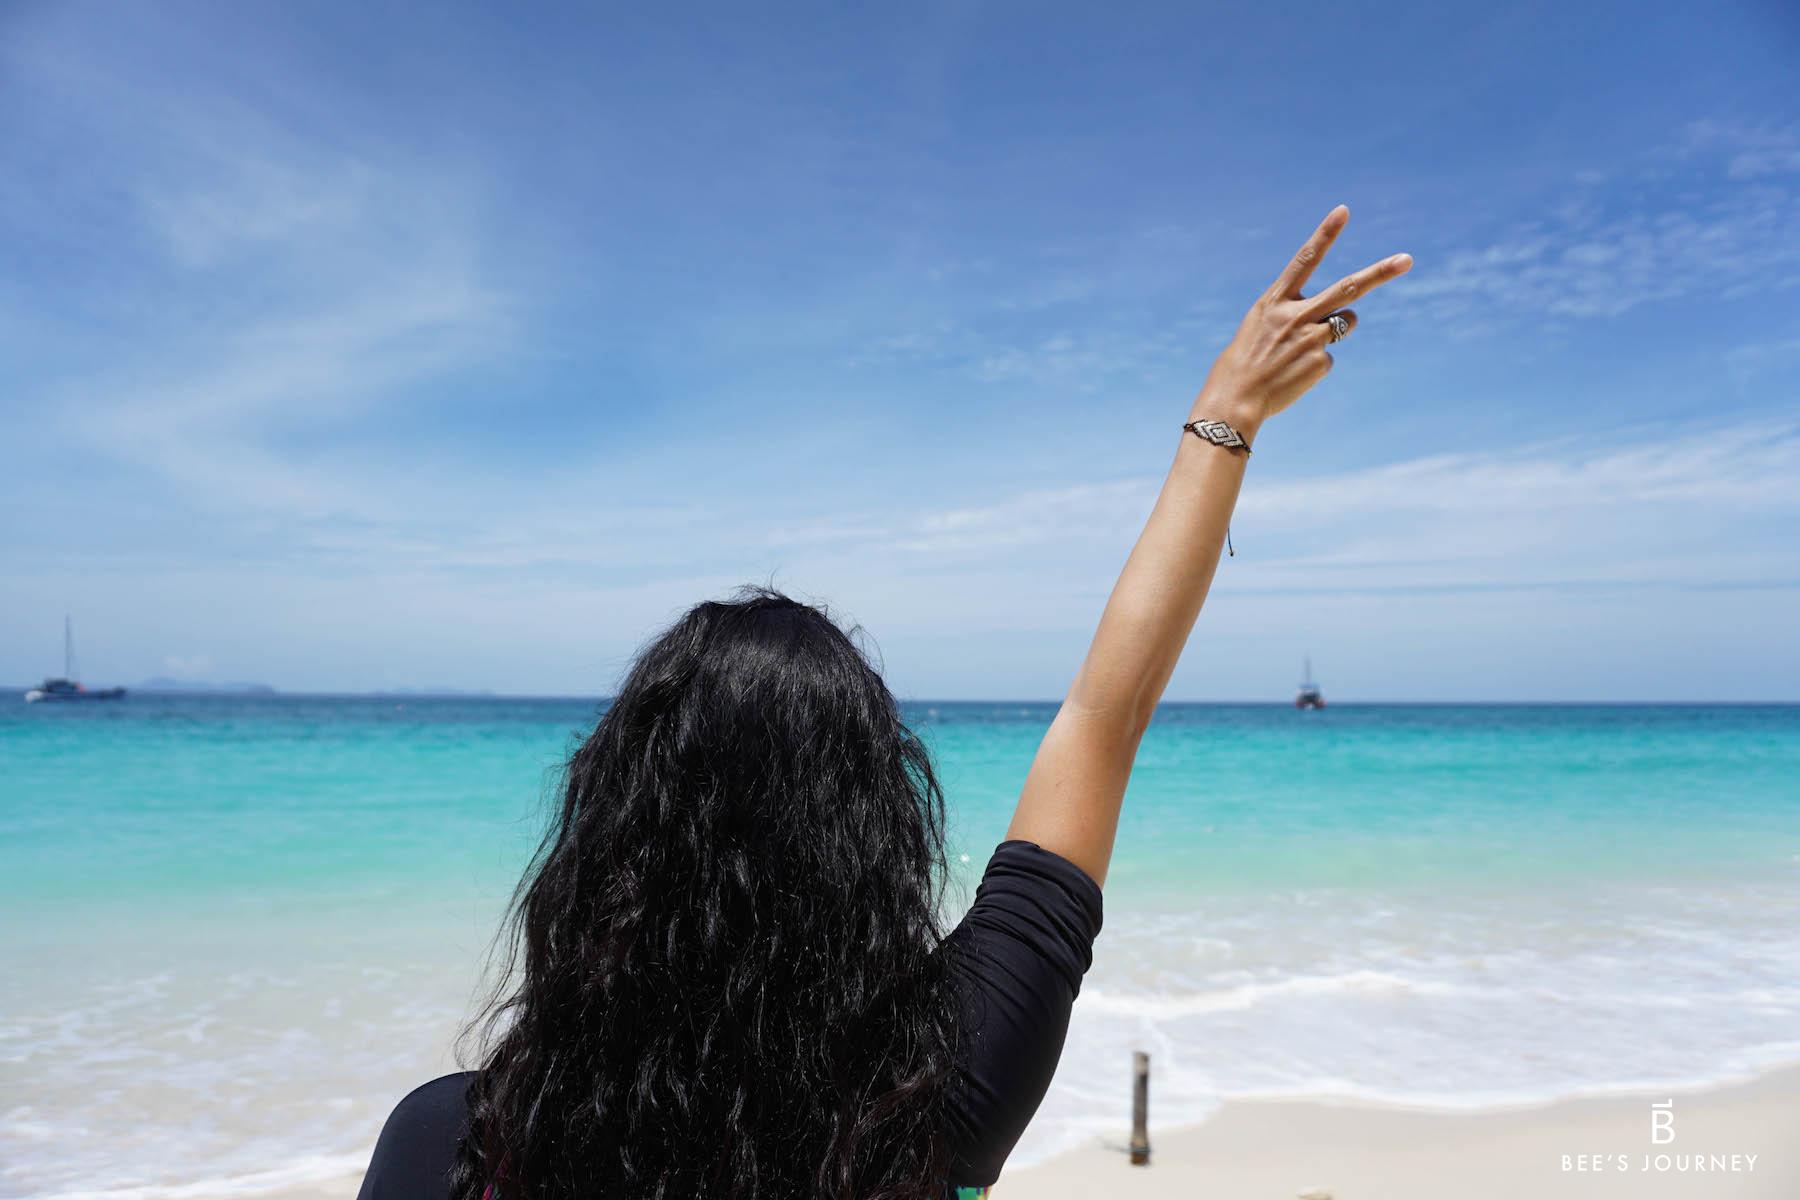 QUICK GETAWAY TO MAITON PRIVATE ISLAND (เกาะไม้ท่อน), PHUKET, THAILAND